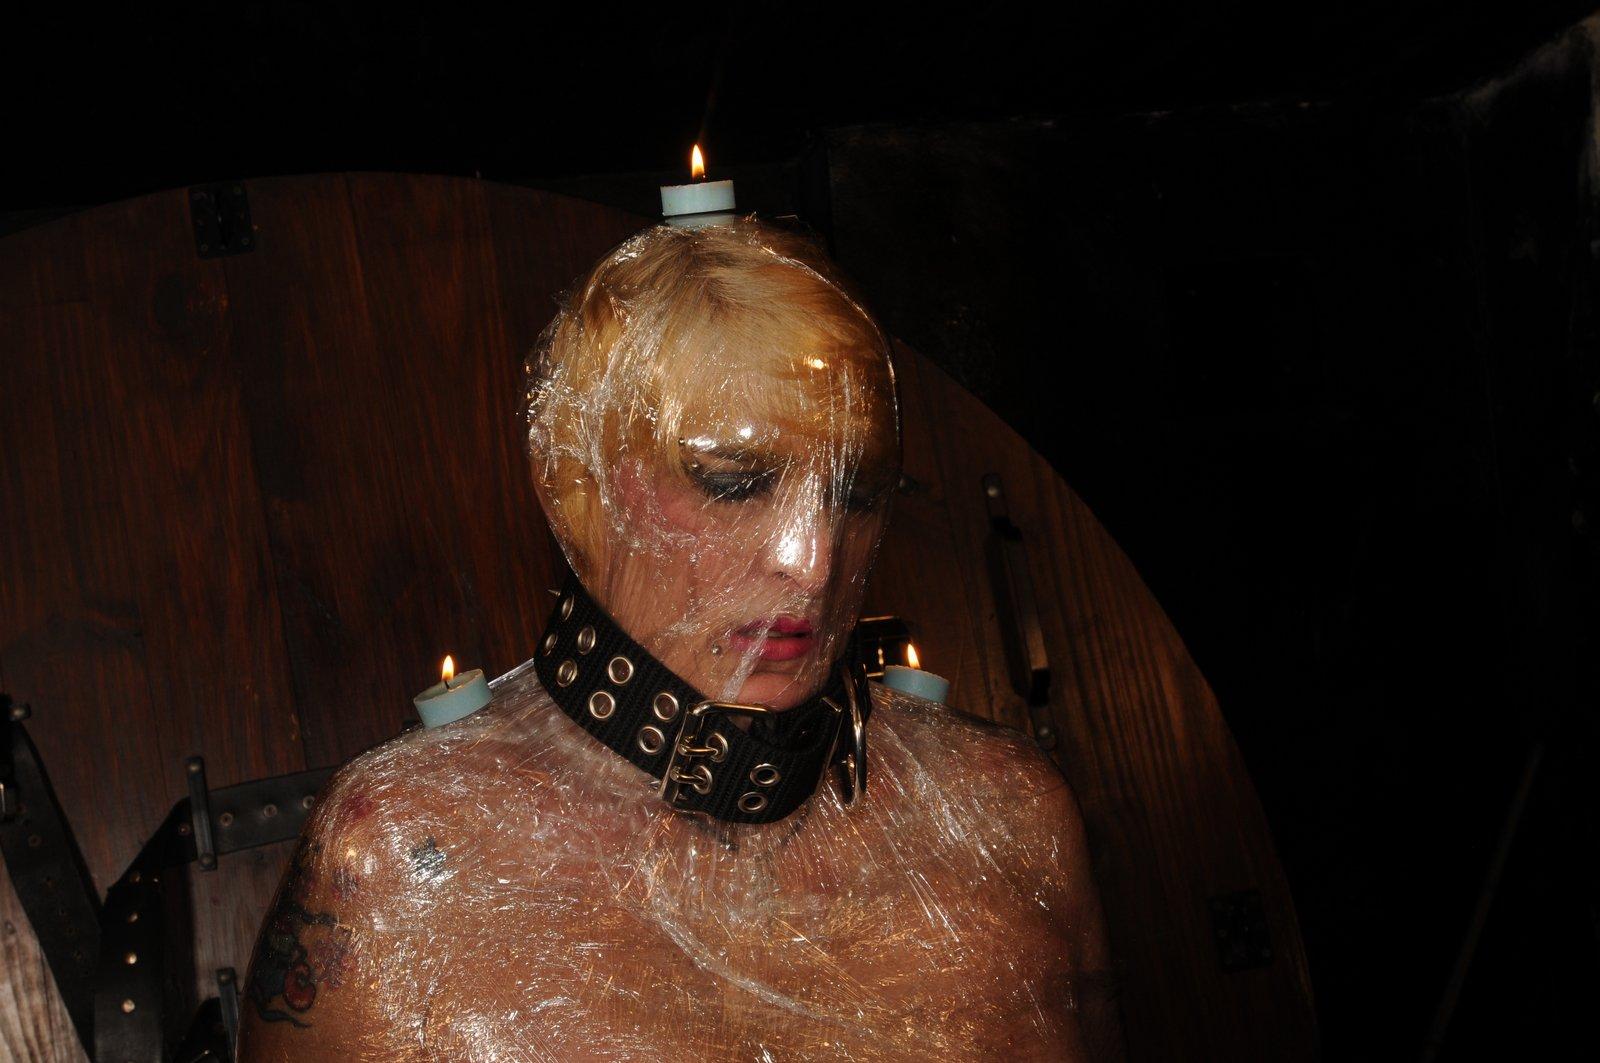 Gamer Girl's Mummy Mishap, Mummification Bondage